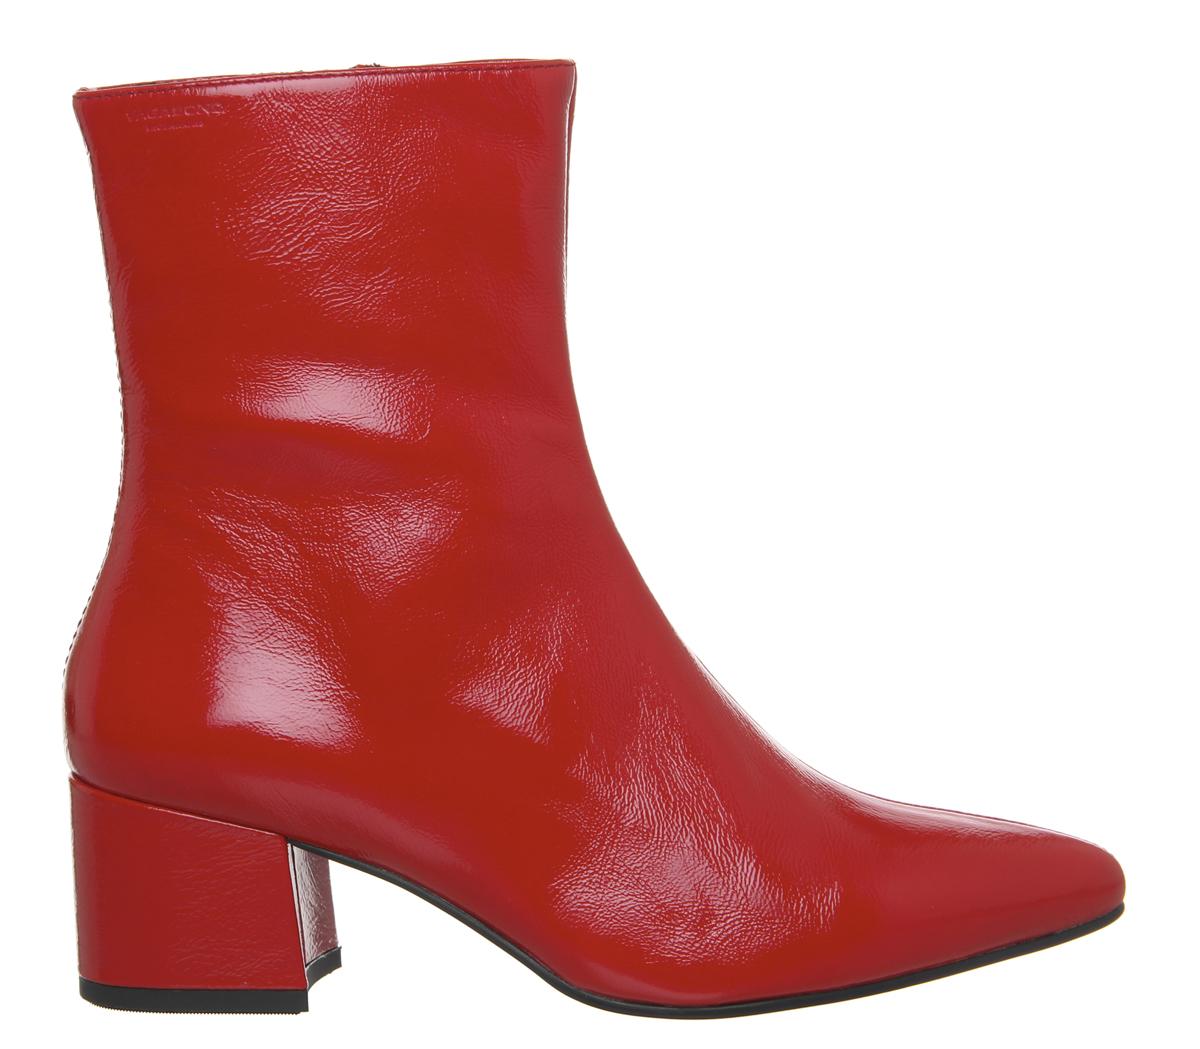 Vagabond rossa Stivaletti vernice donna Mya in Mid Wc0wRw46pq